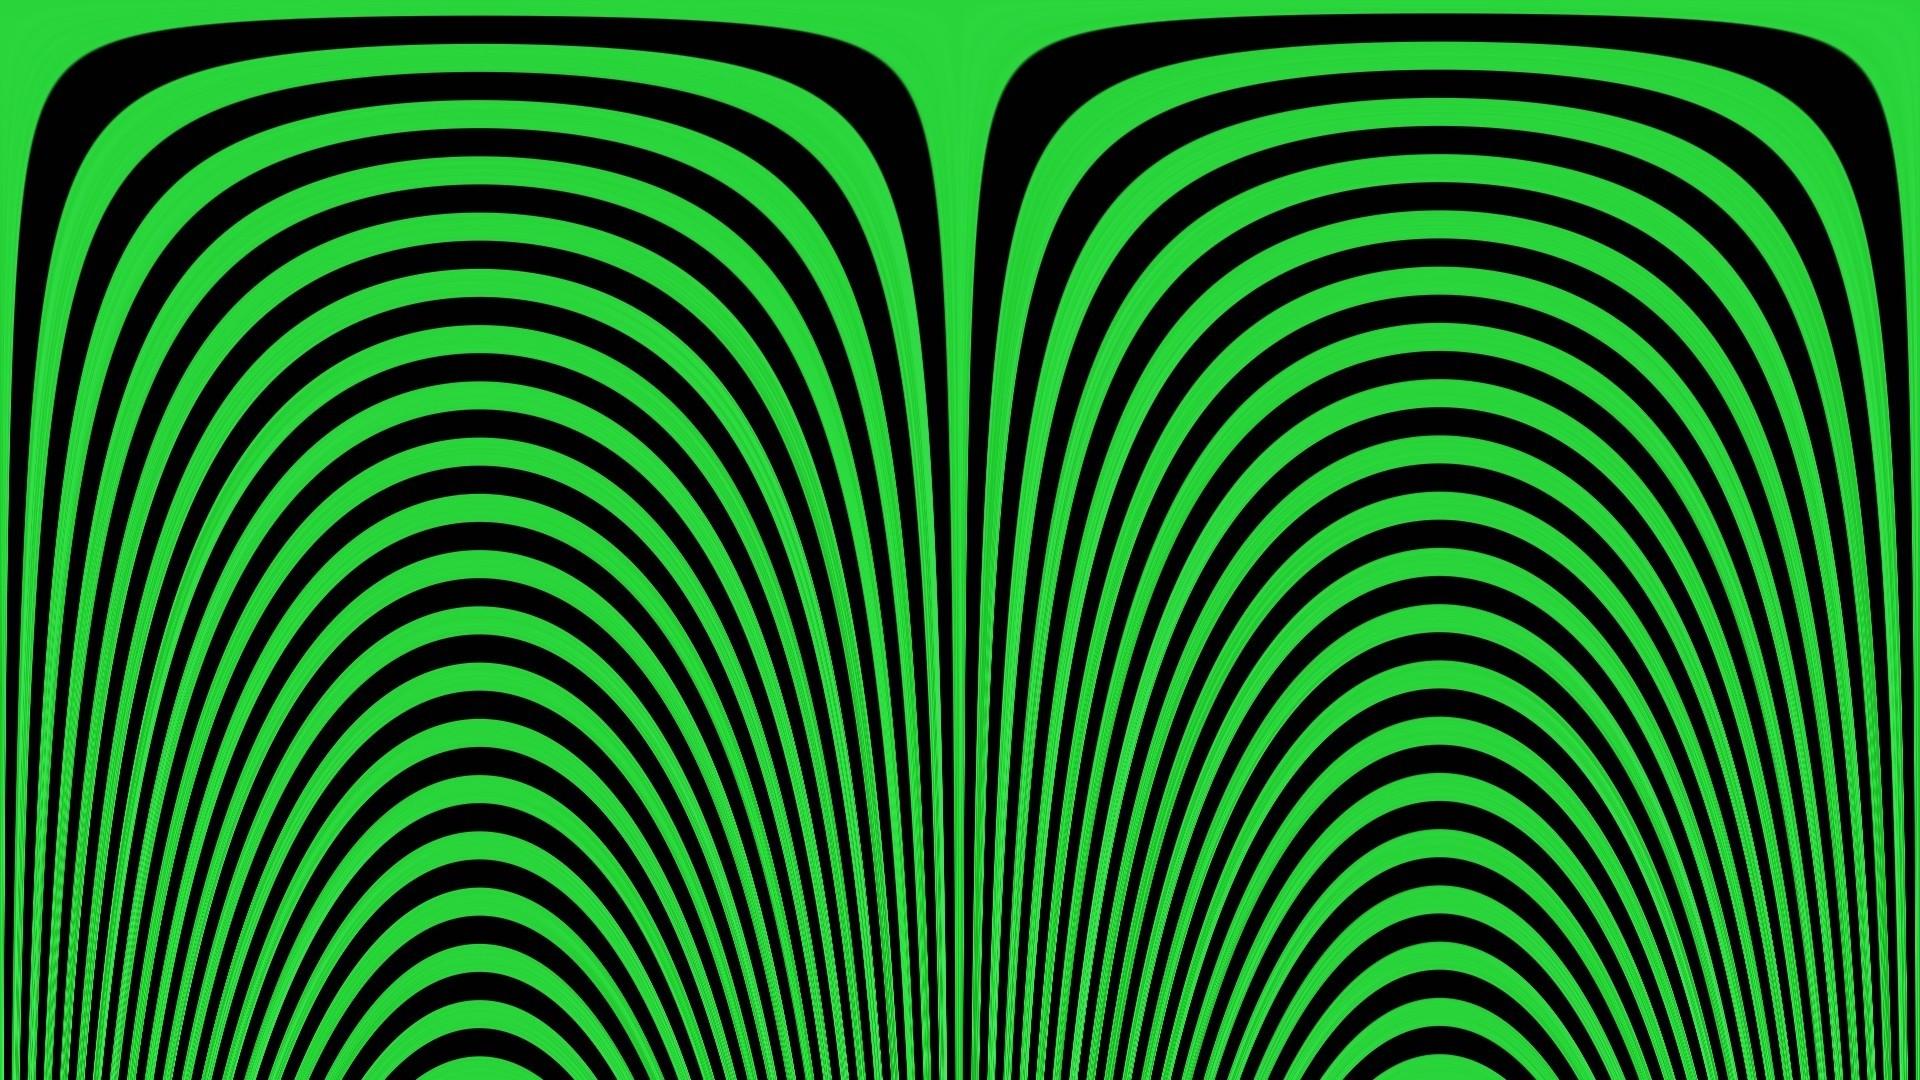 3d Illusion Wallpaper 58 Images